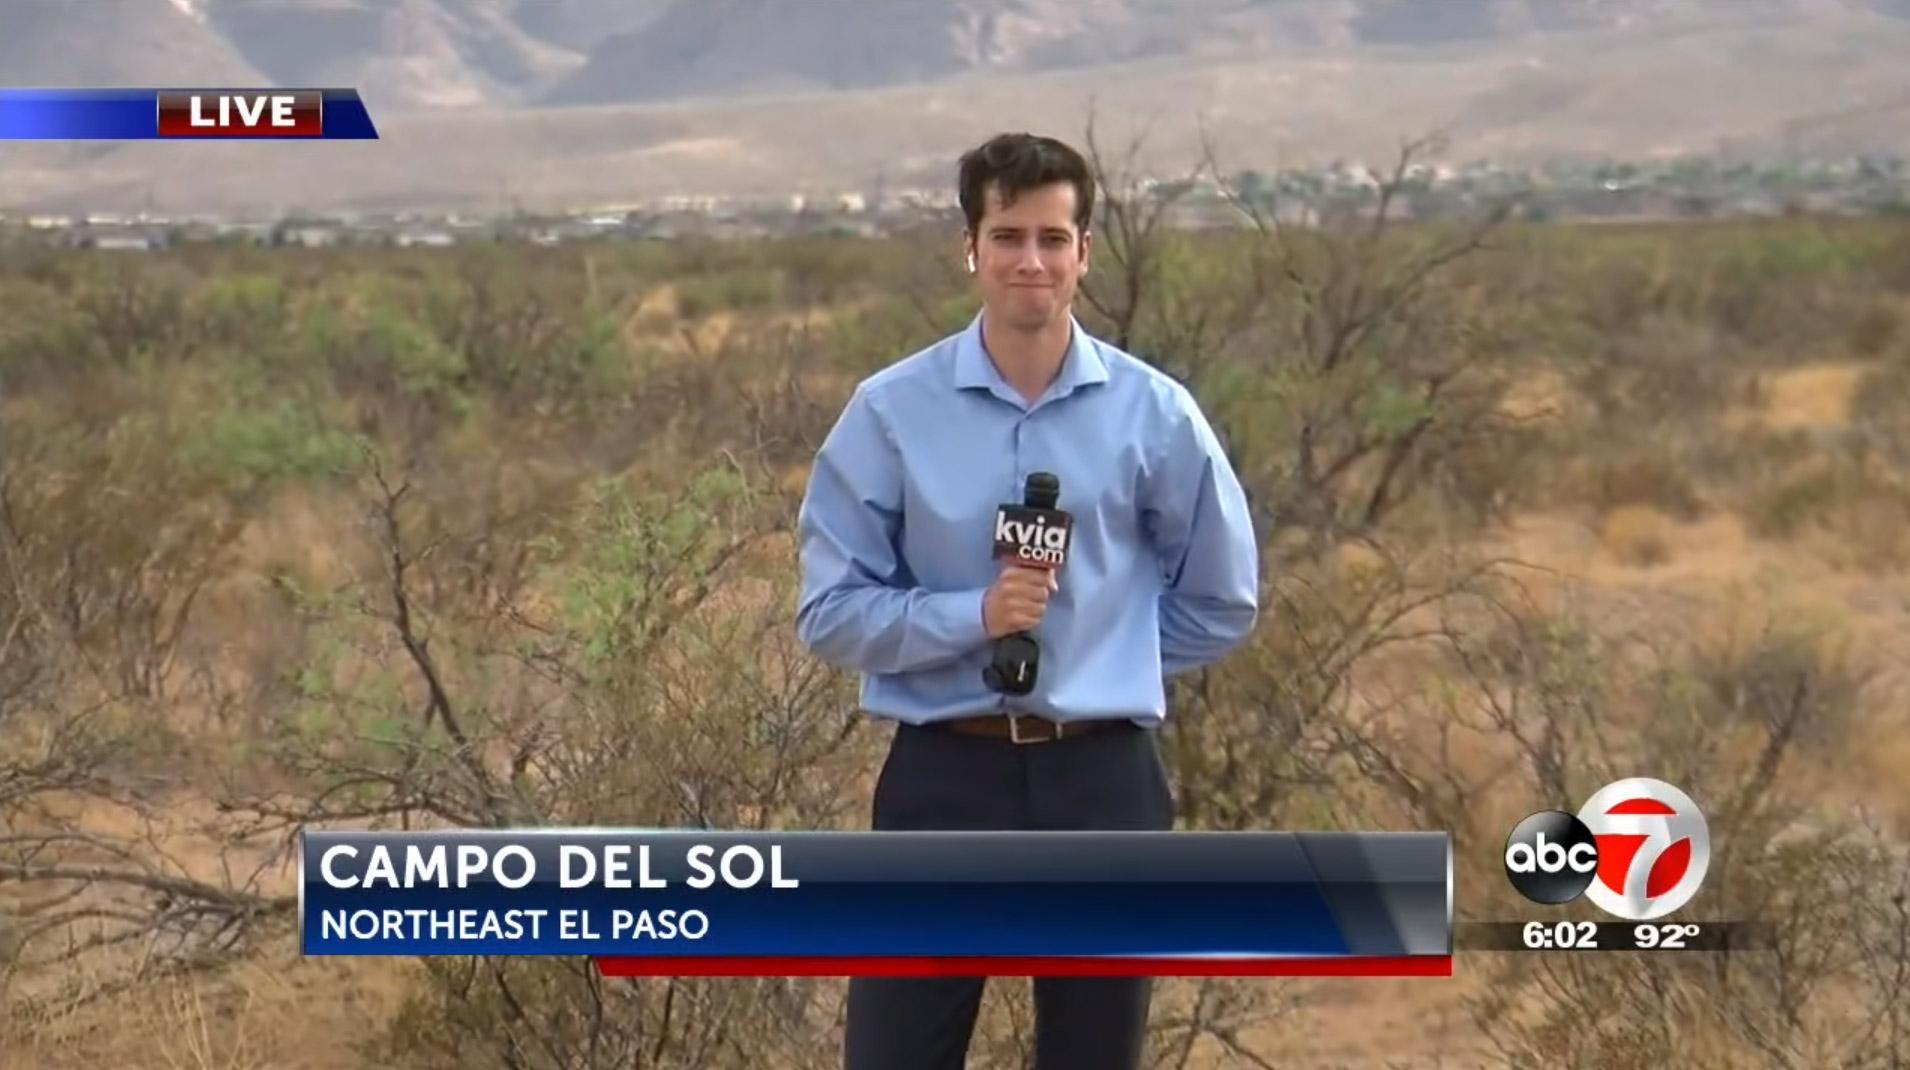 Resort-living community set to break ground in northeast El Paso